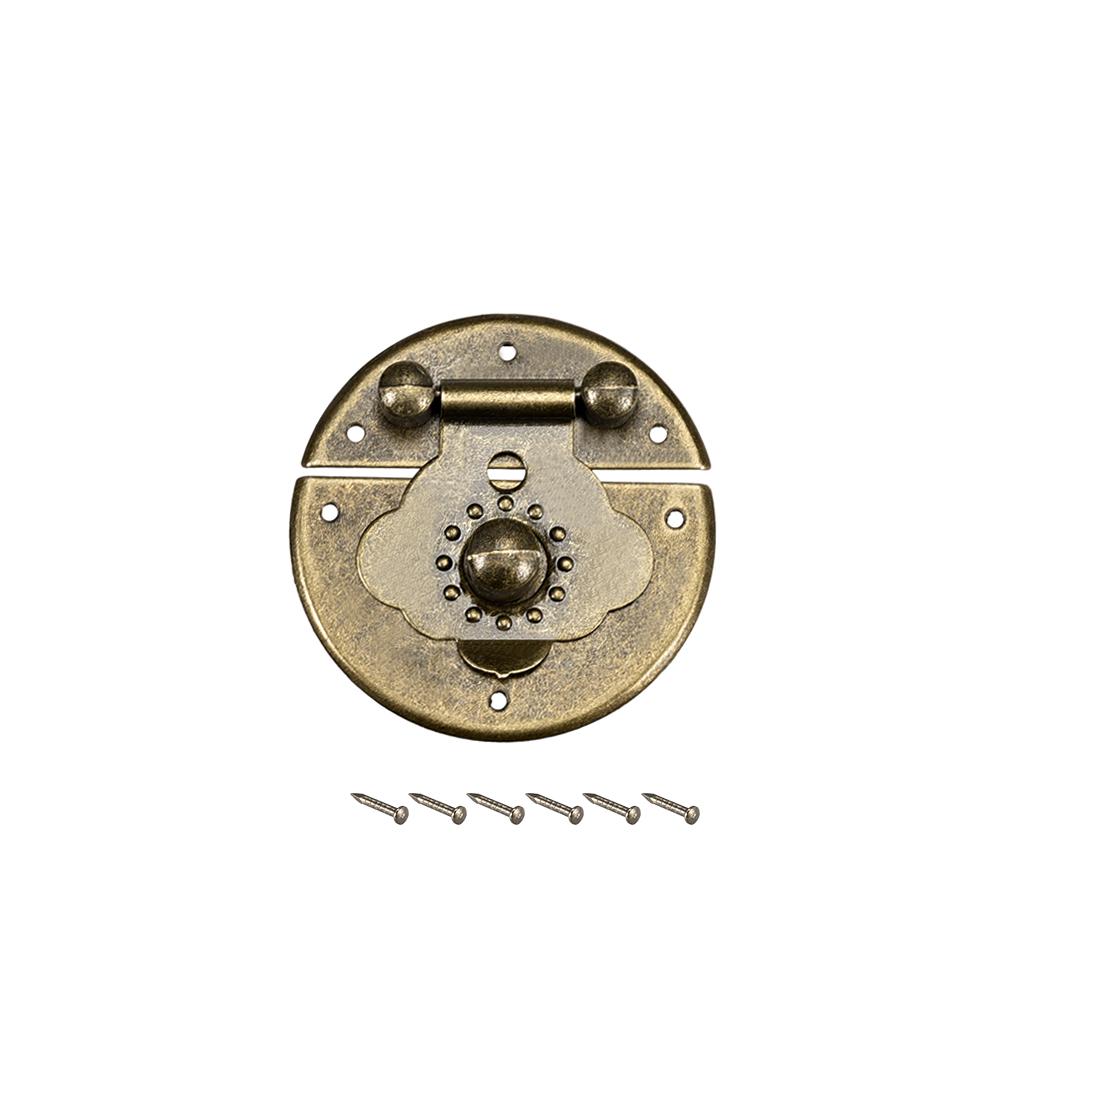 Wood Case Box Round Hasp 41x10.5mm Closure Antique Latches Bronze Tone, 4 Pcs